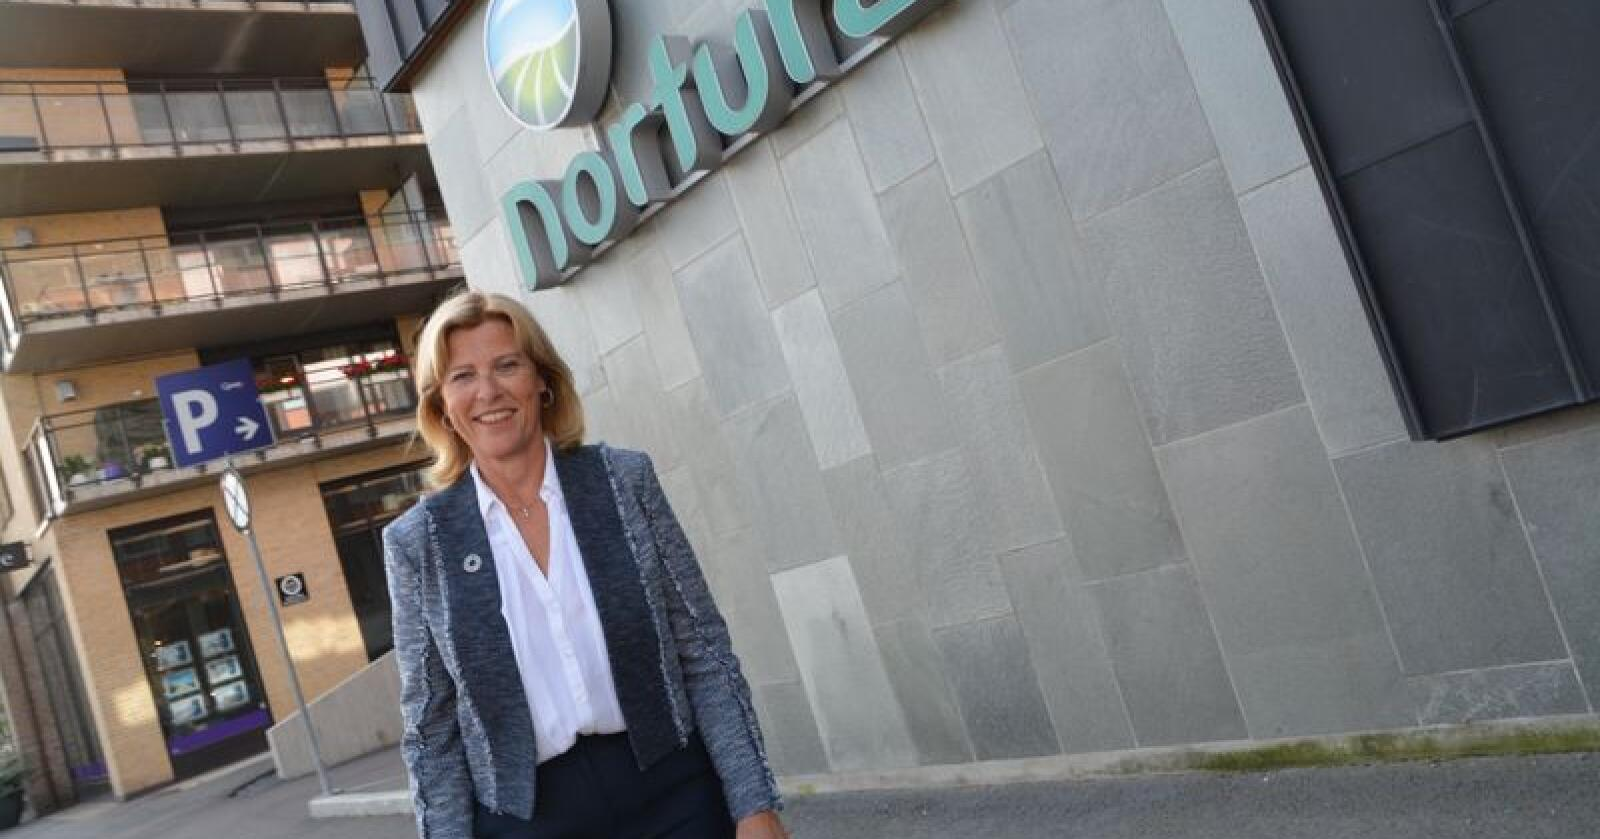 Sjef: Anne Marit Panengstuen er ny konsernsjef i Nortura. (Foto: Anders Sandbu)